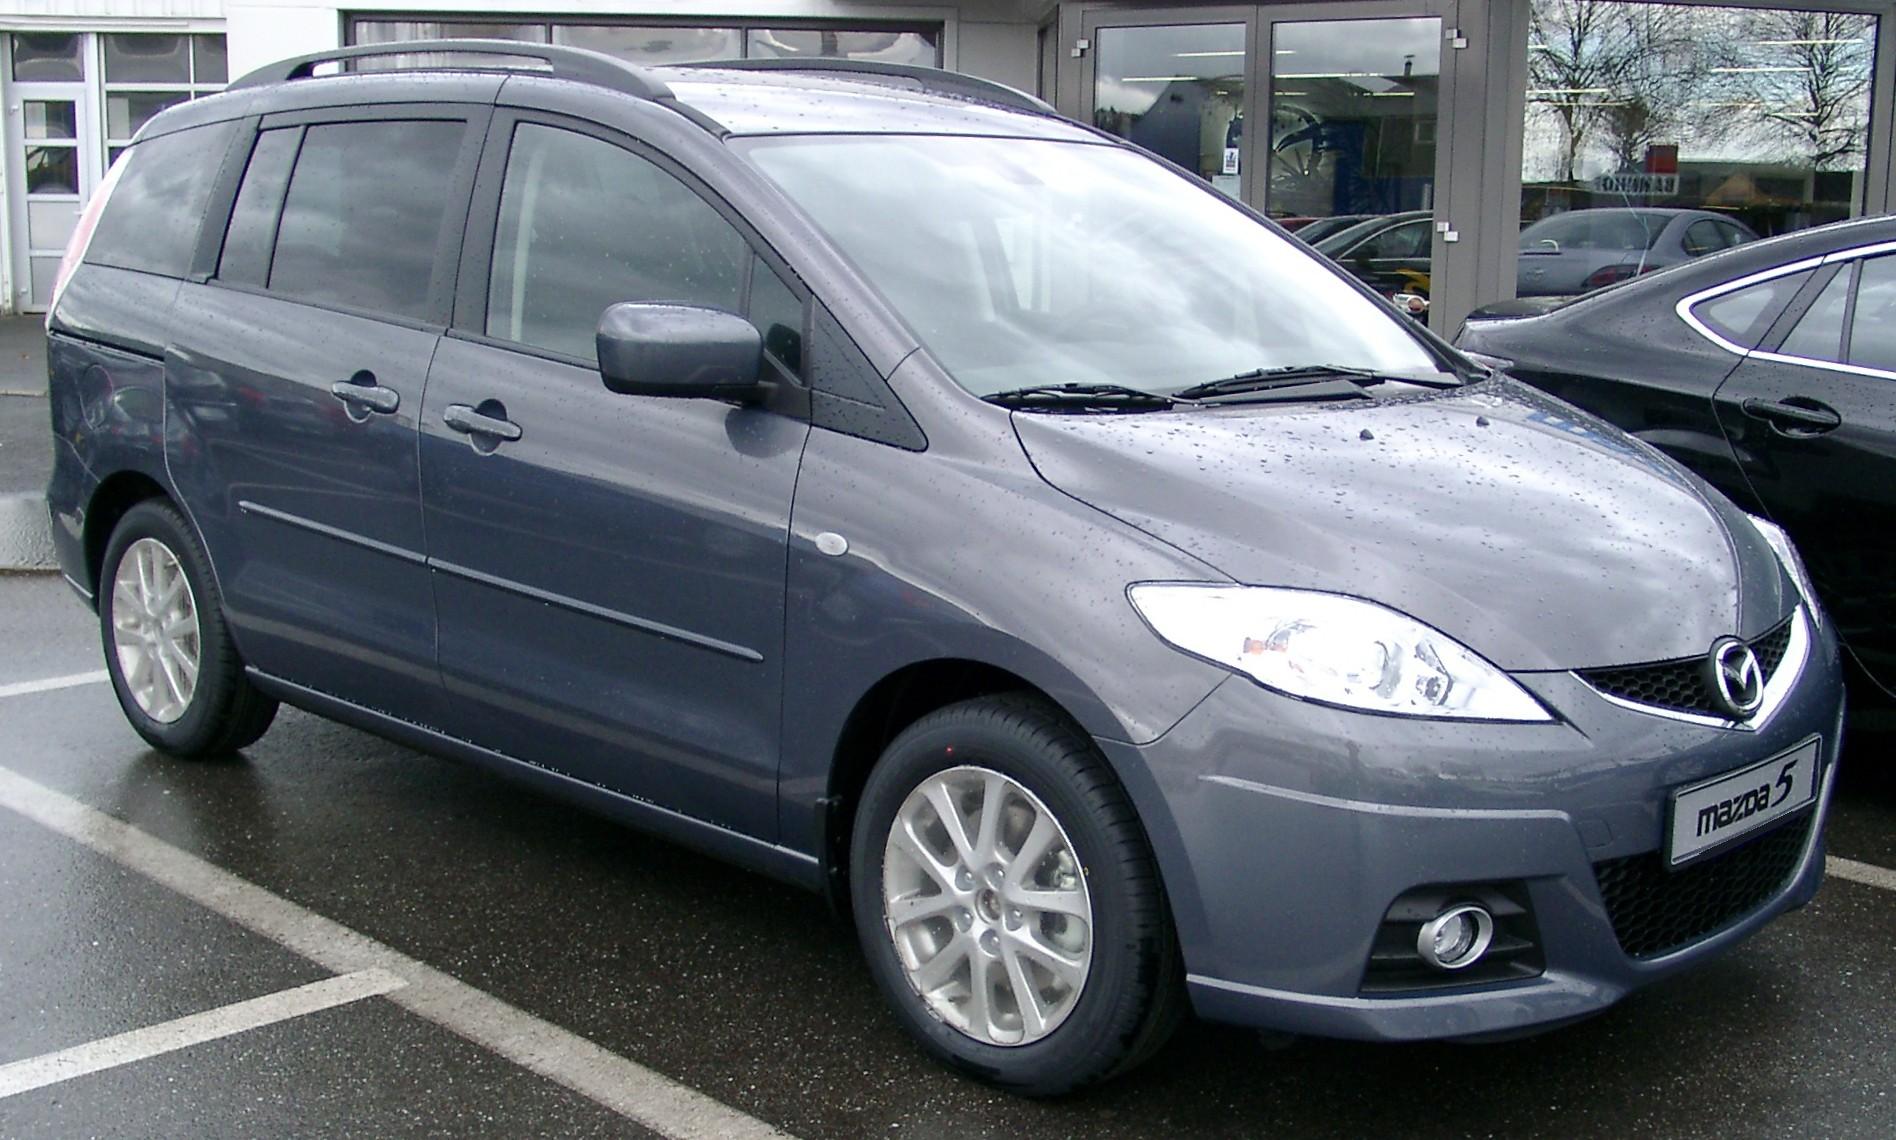 https://upload.wikimedia.org/wikipedia/commons/4/40/Mazda_5_front_20080312.jpg